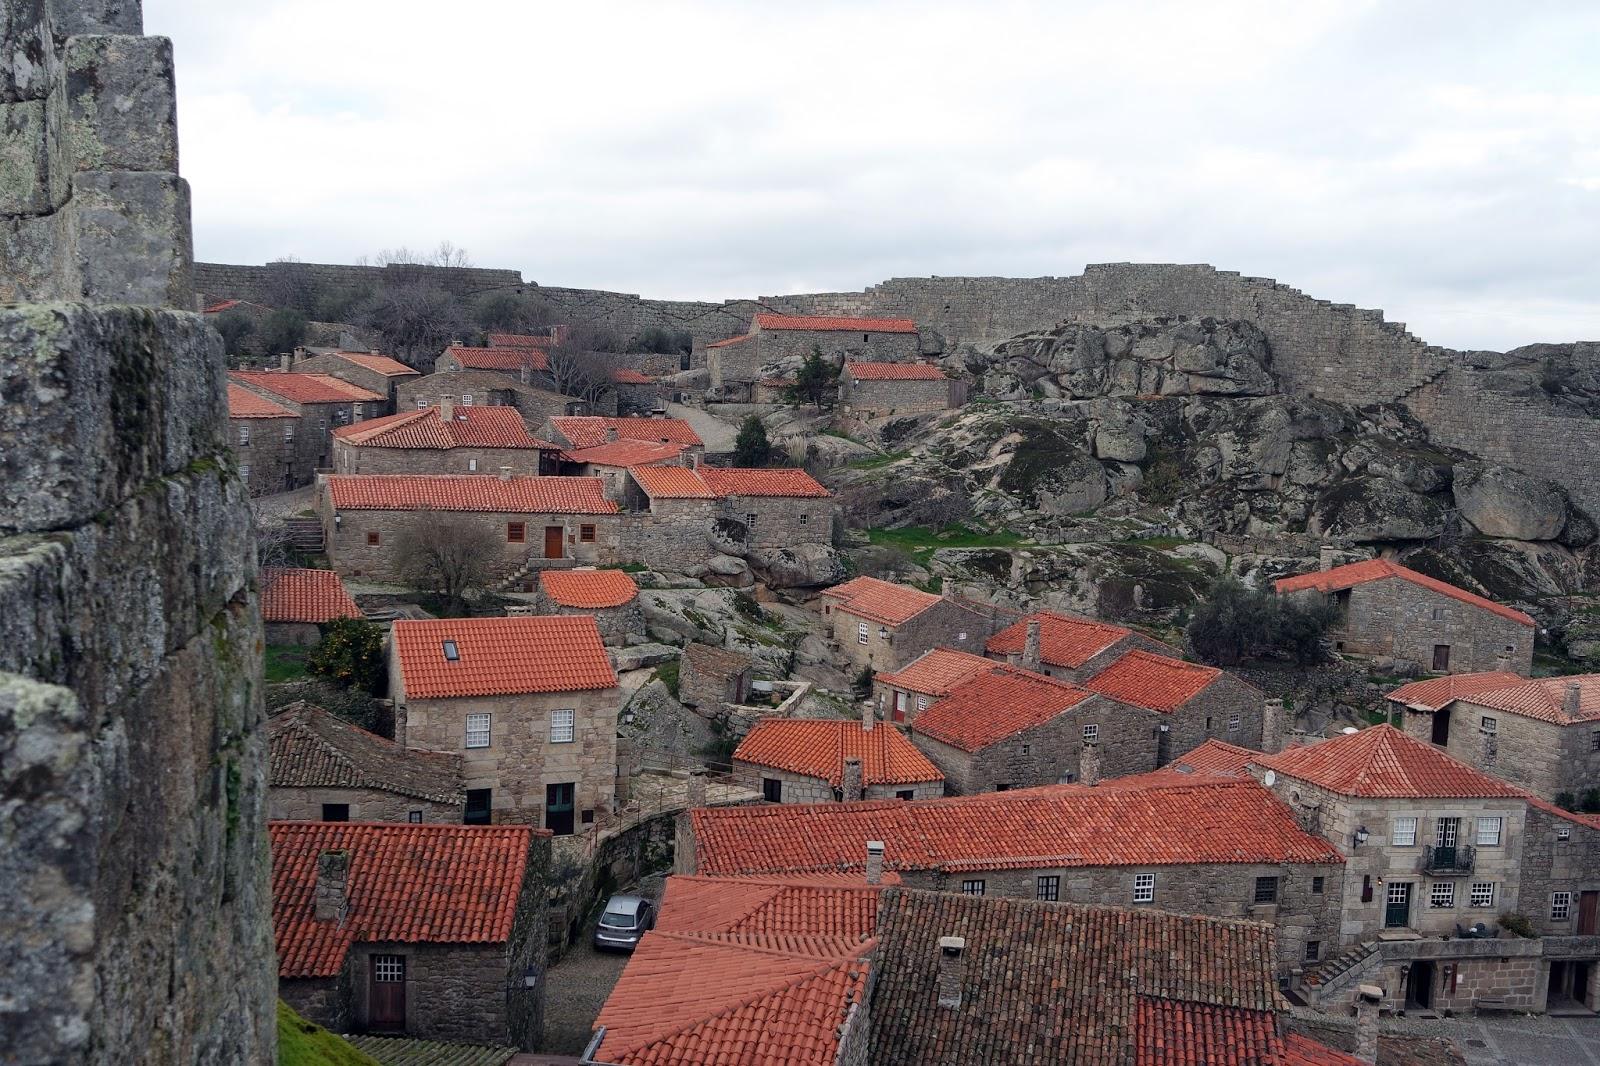 http://aondenaoestou.blogspot.pt/2016/02/aldeias-historicas-de-portugal-sortelha.html